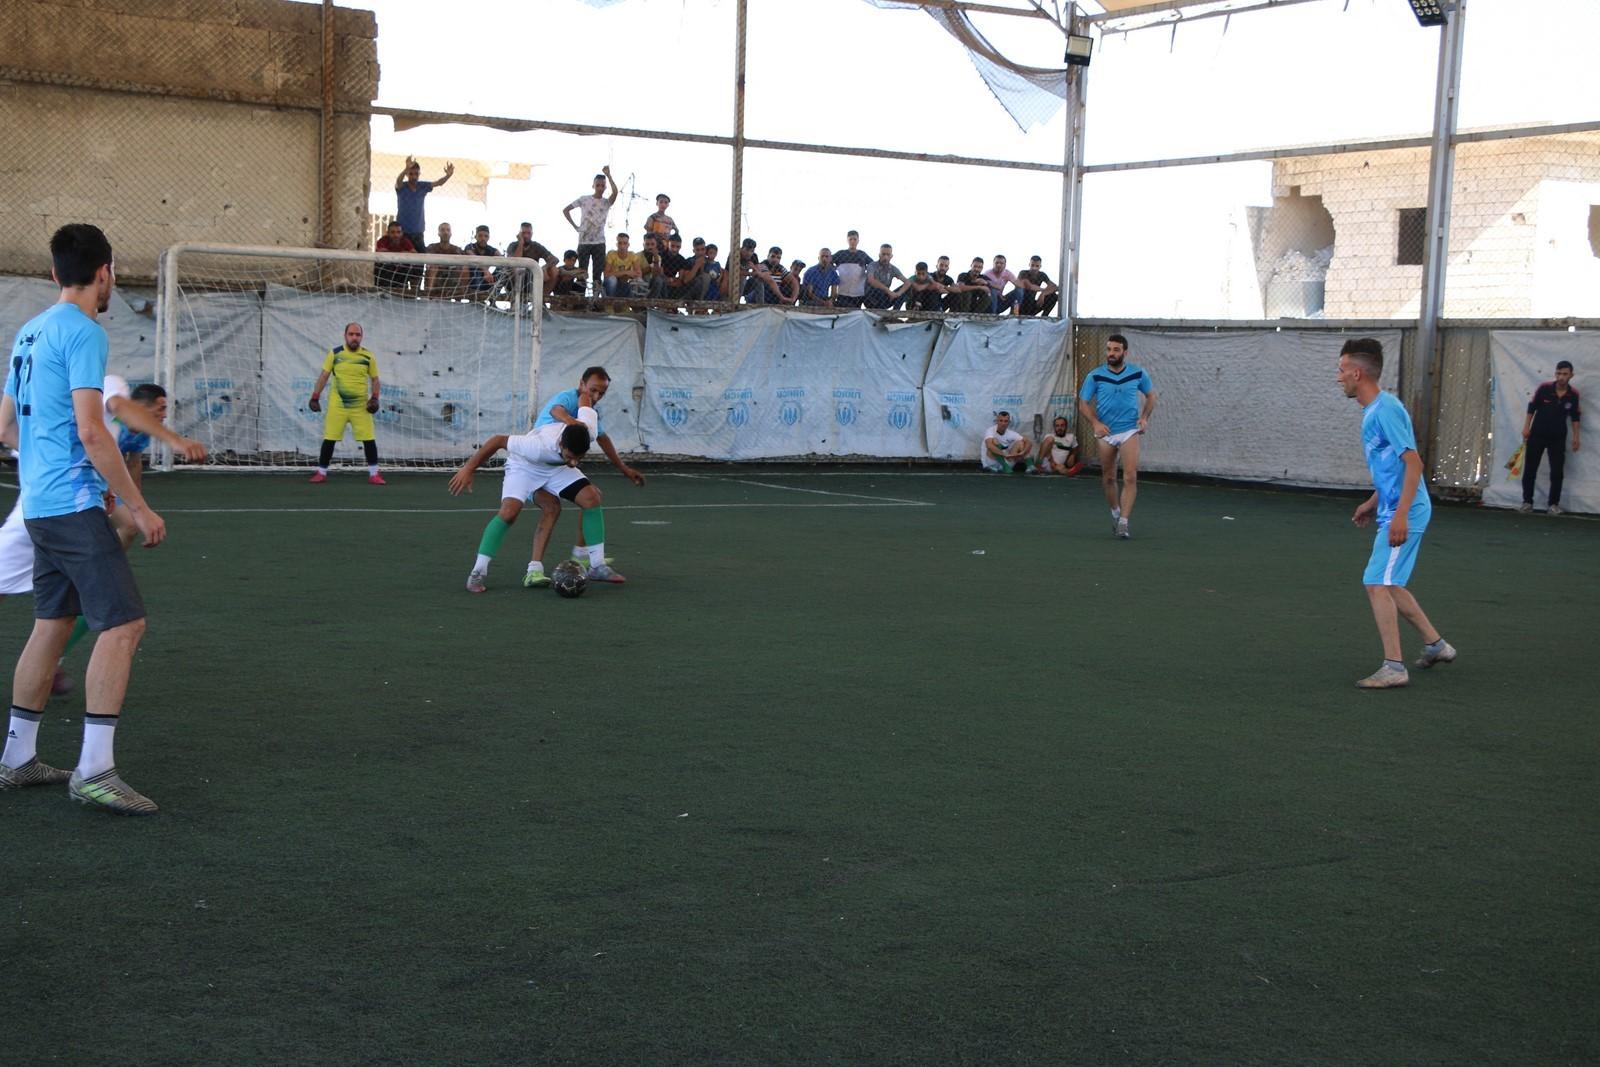 https://www.hawarnews.com/ar/uploads/files/2021/07/12/170749_heleb-futbol-28429.jpg